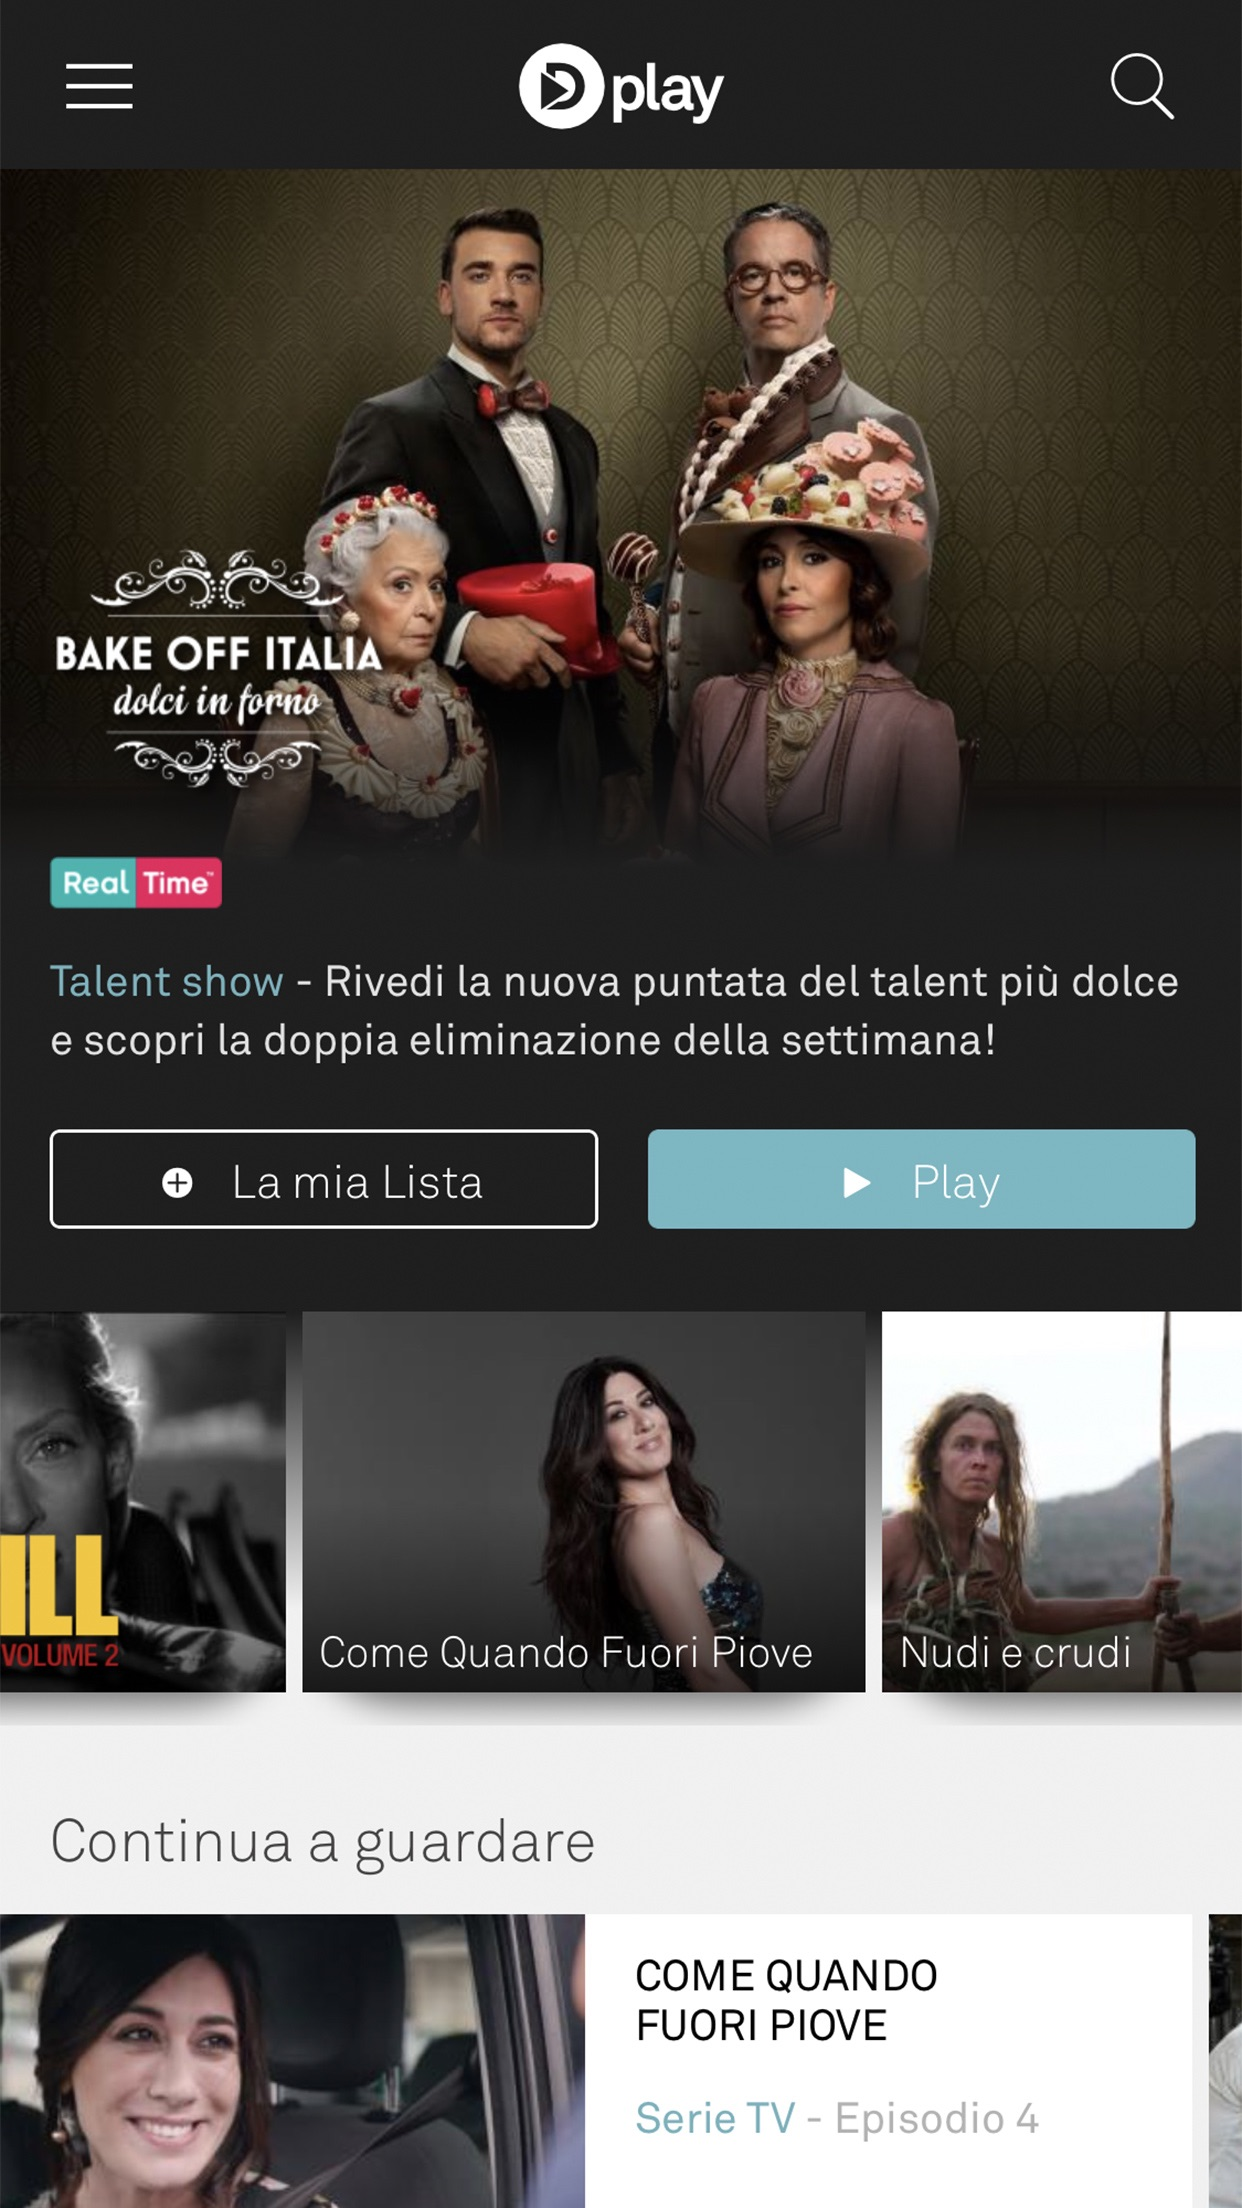 Dplay Screenshot